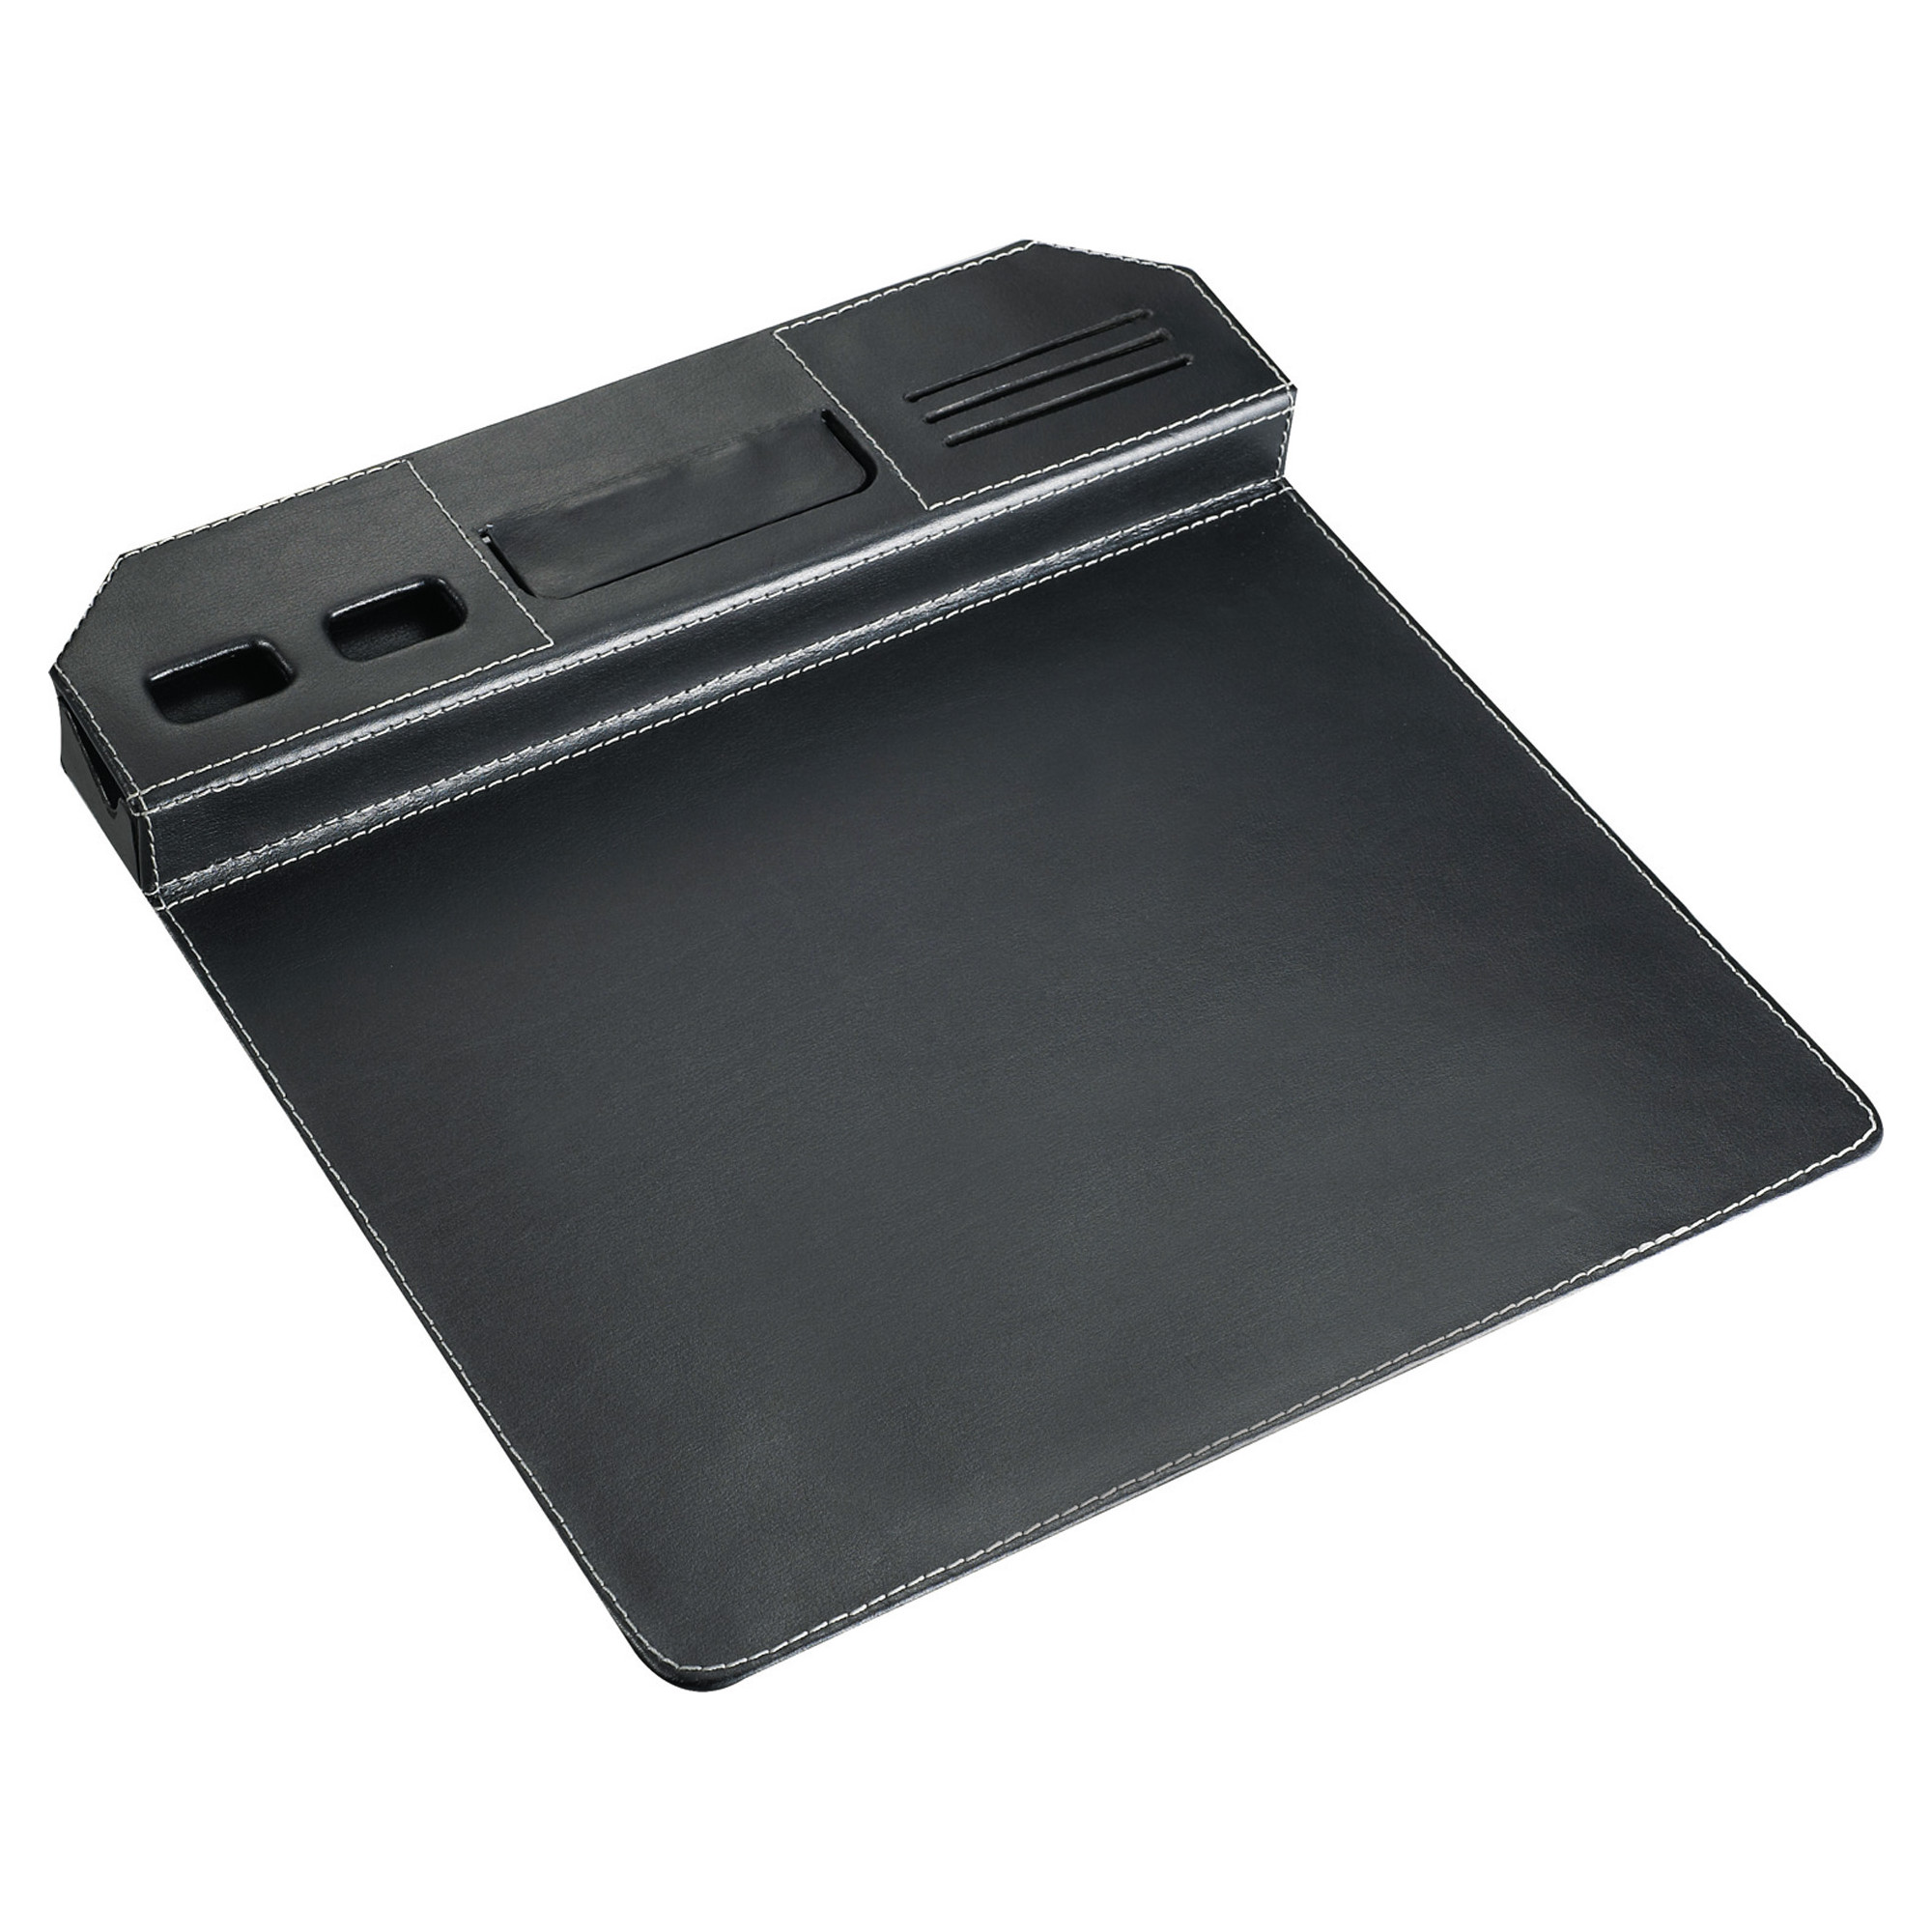 Metropolitan Smart Phone Mouse Pad & Business Card/USB Flash Drive ...